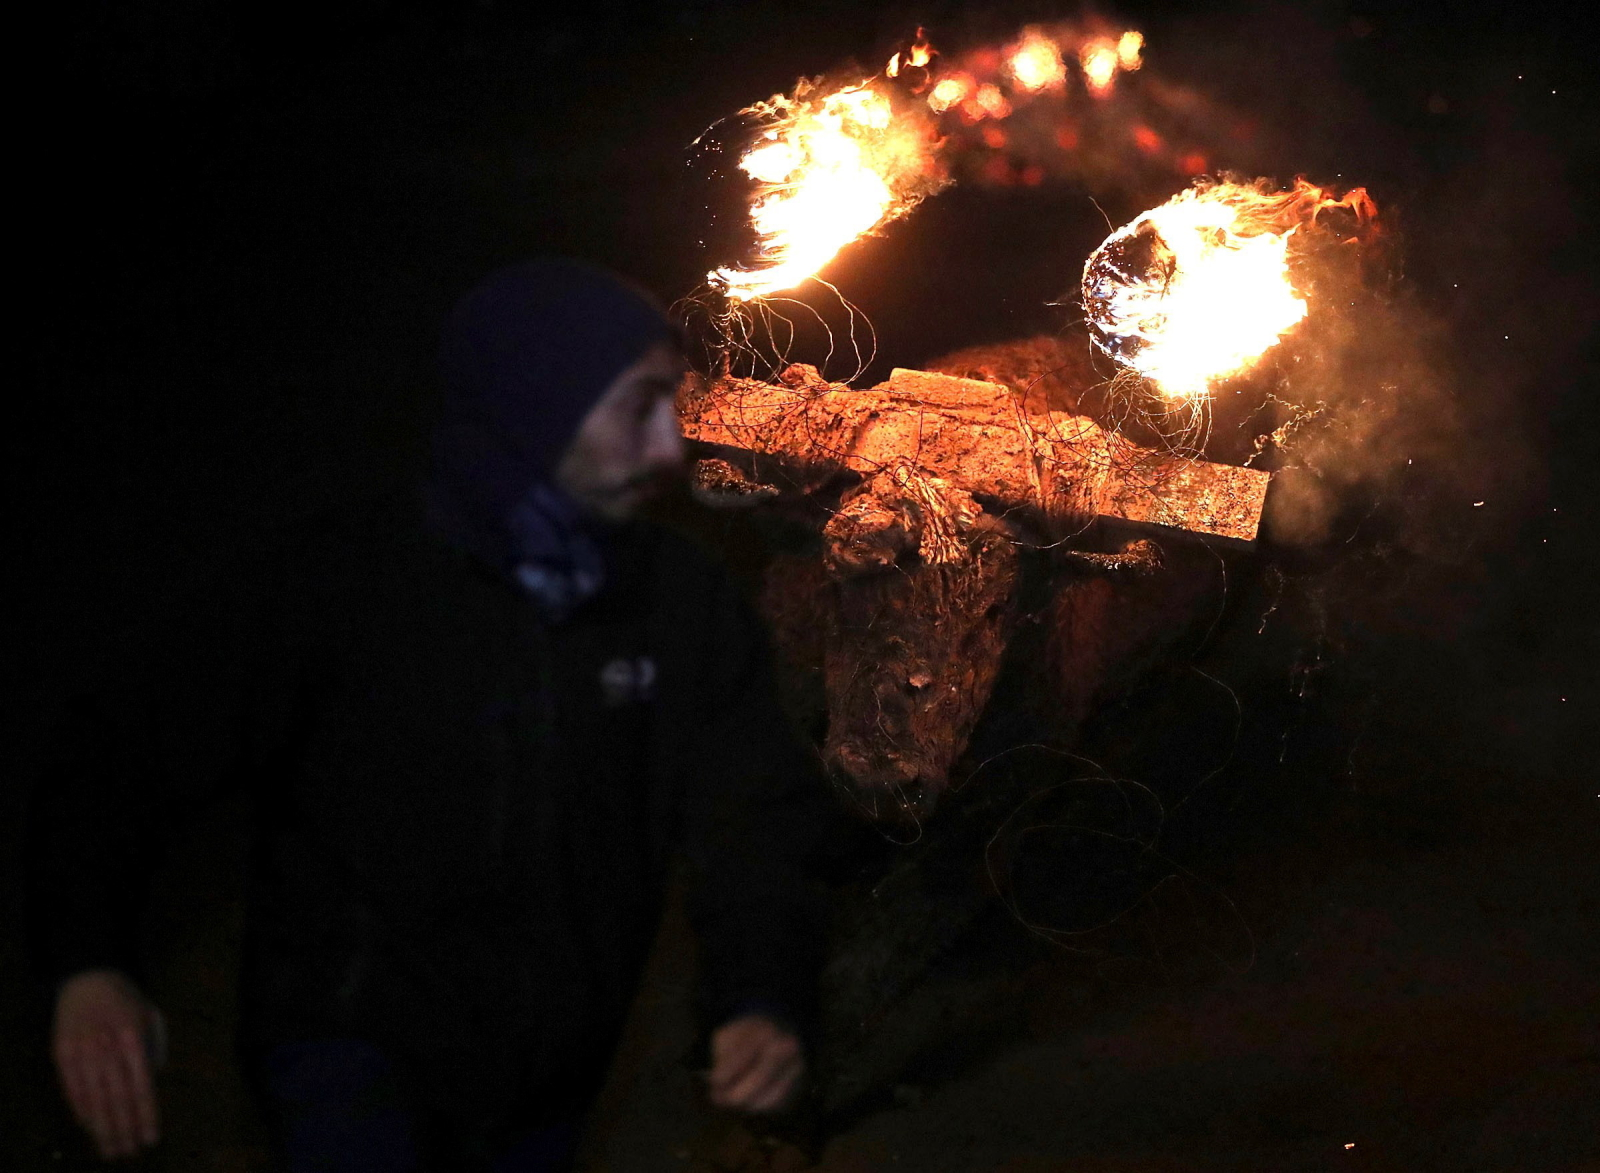 Festiwal ognia fot. EPA/WIFREDO GARCIA